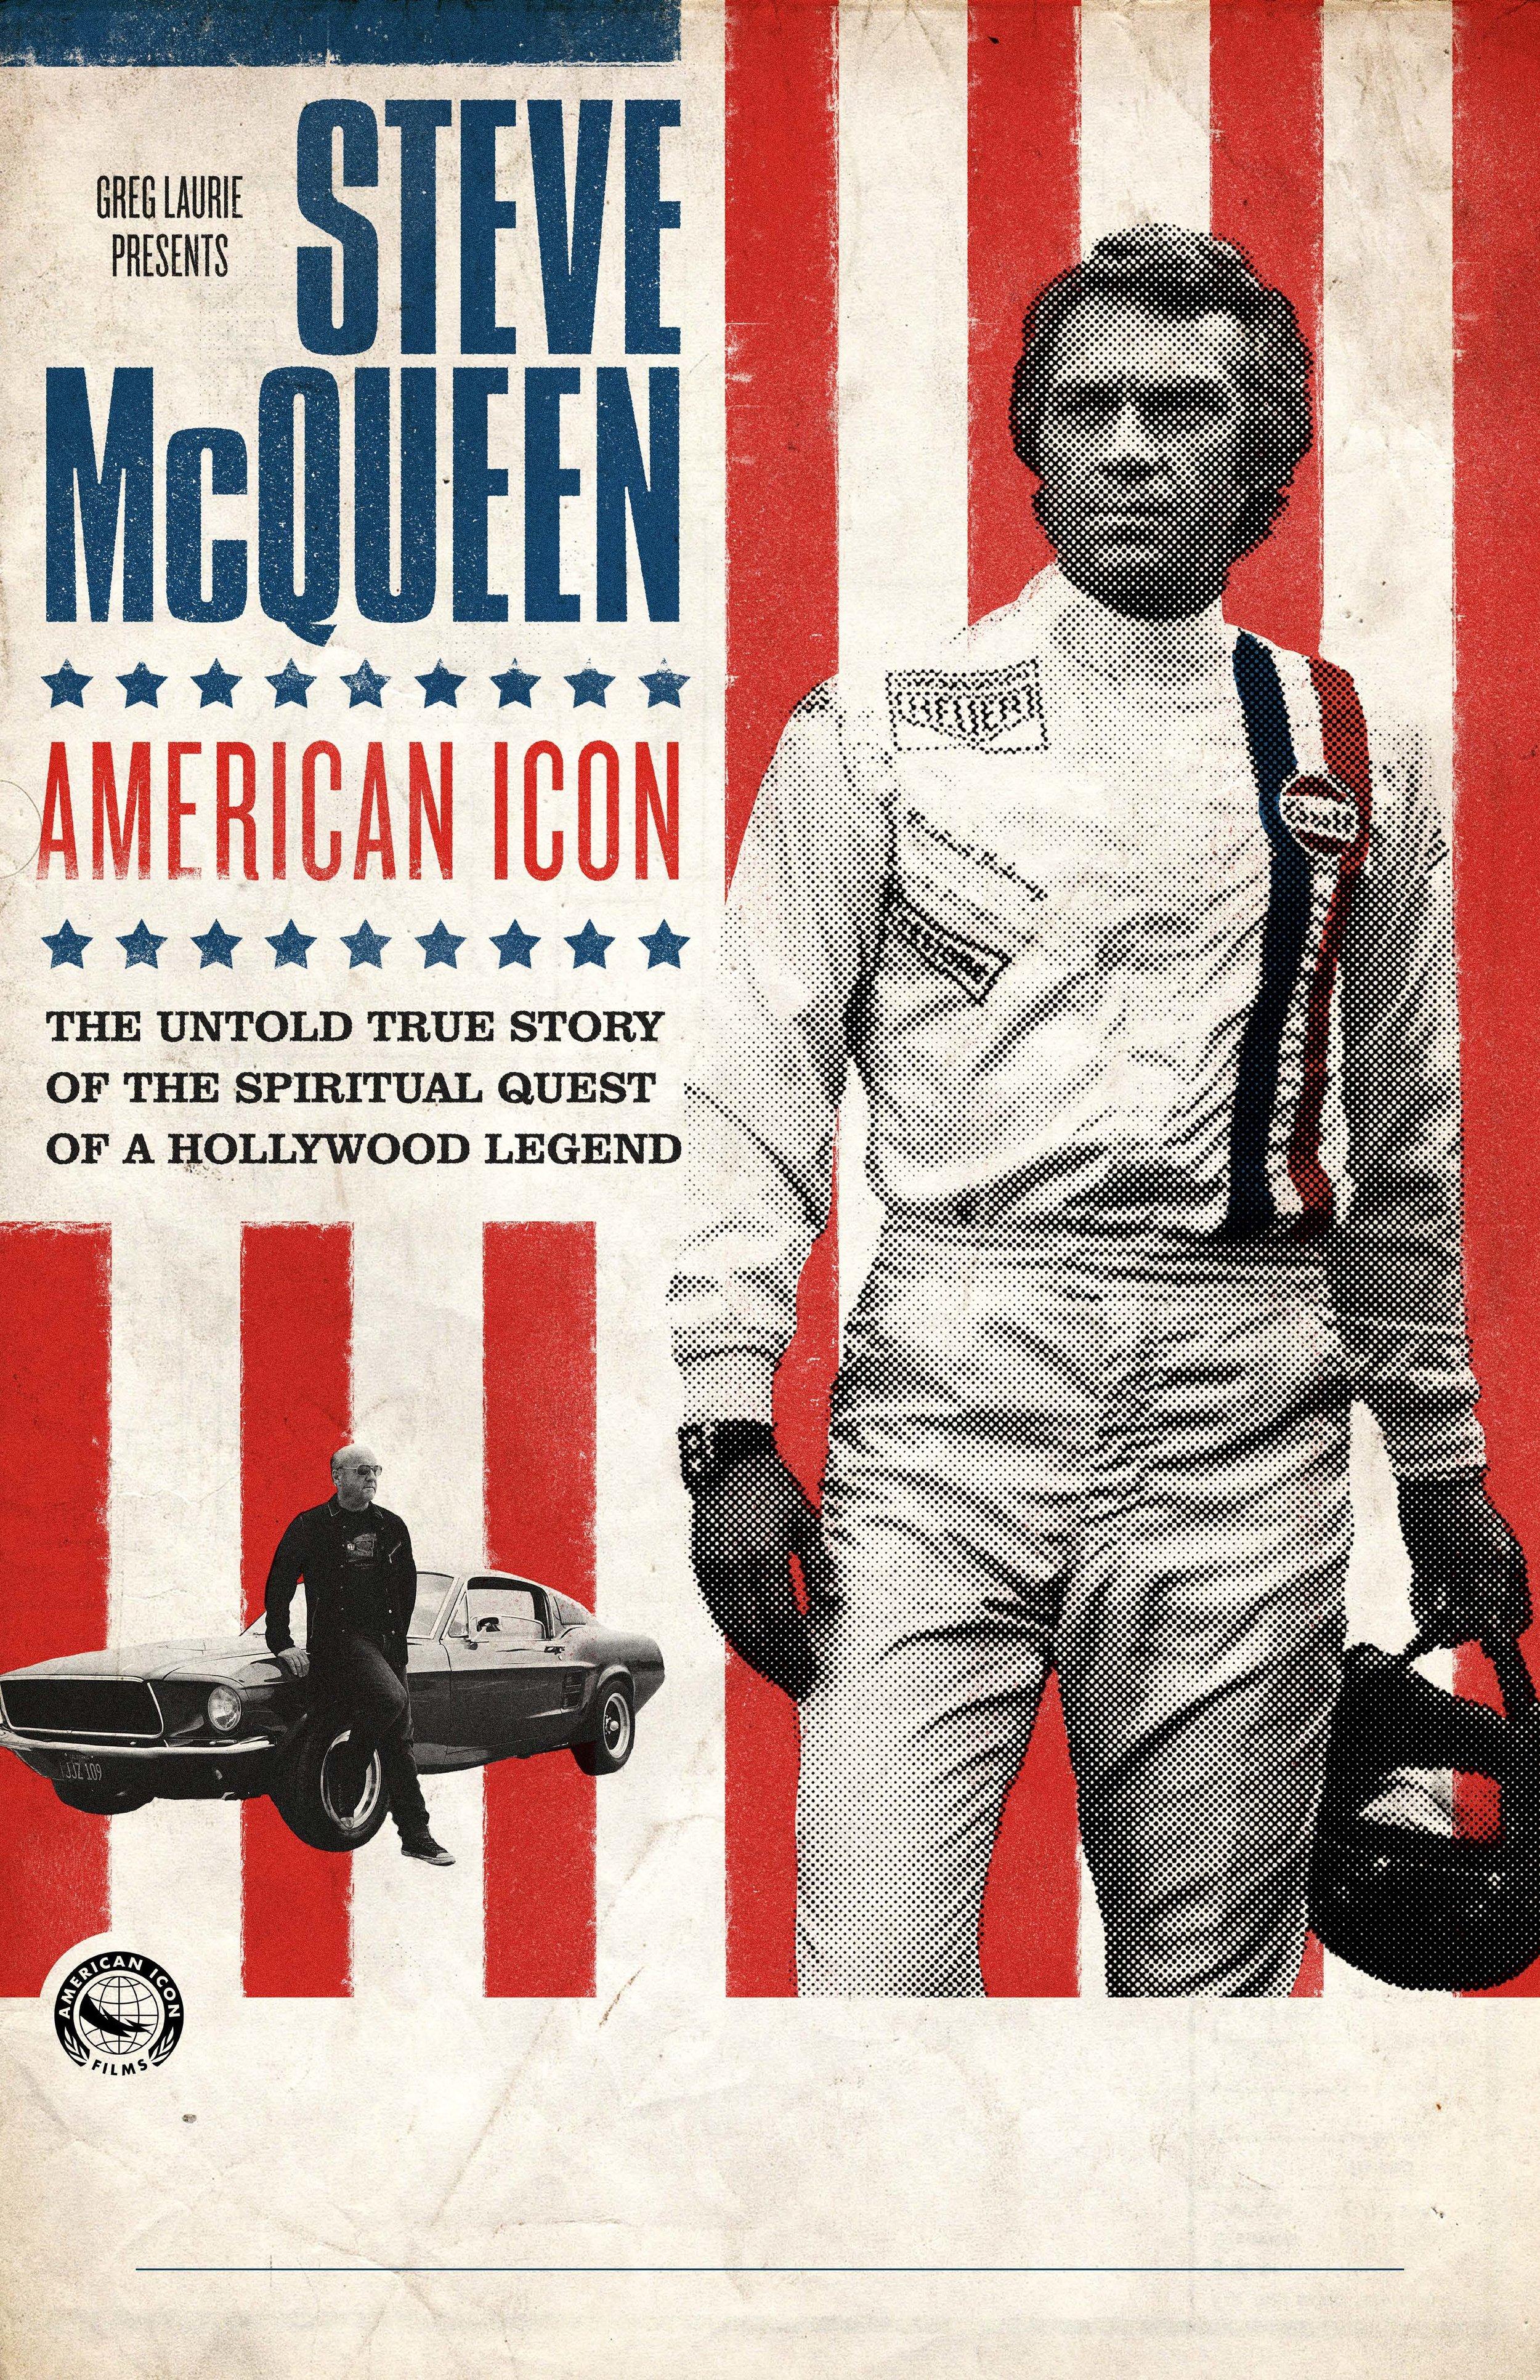 Steve McQueen: American Icon    Jon Erwin and Ben Smallbone   View More →